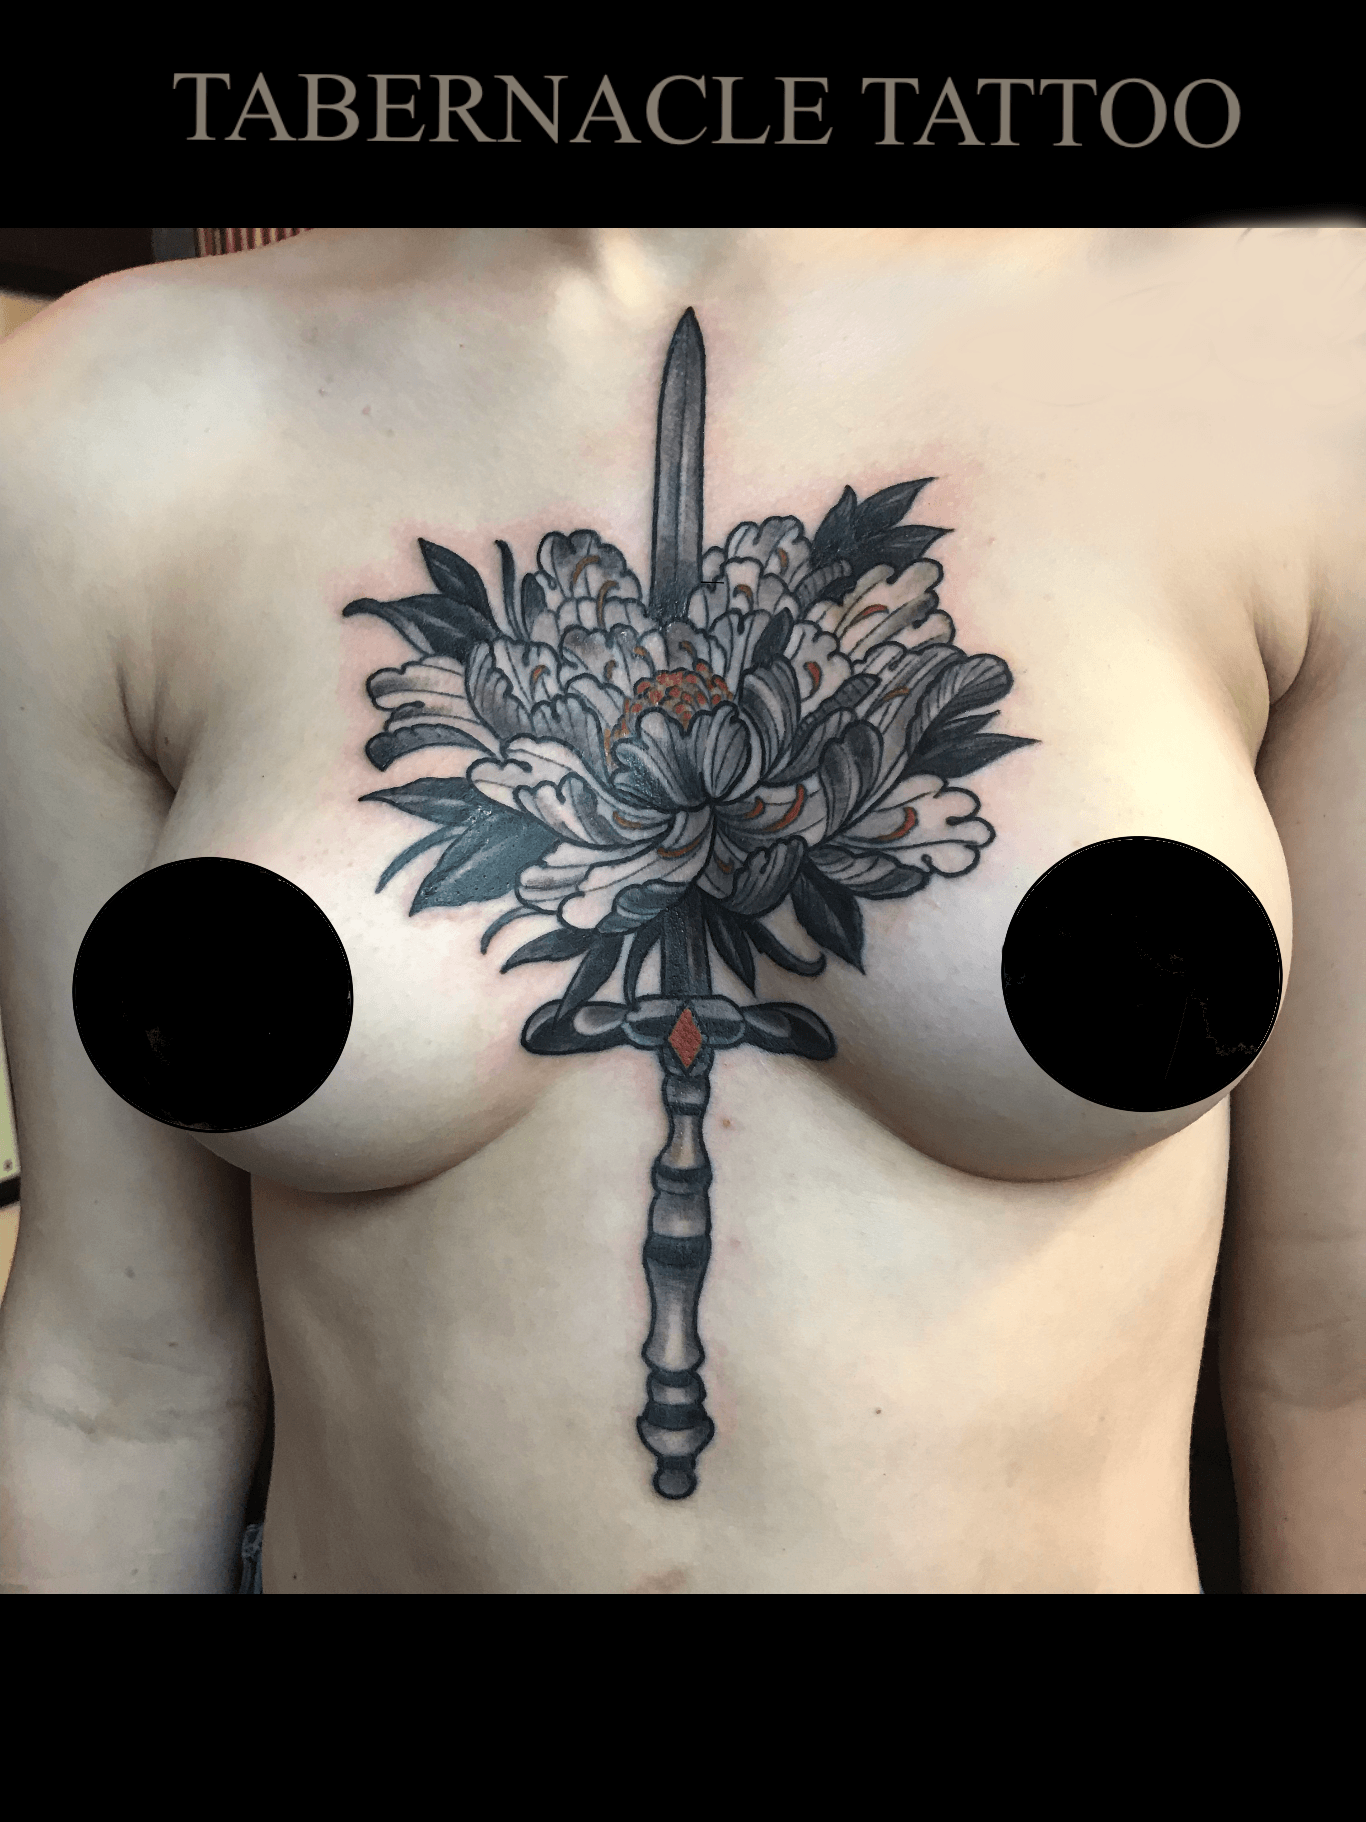 Sword through Peony Flower